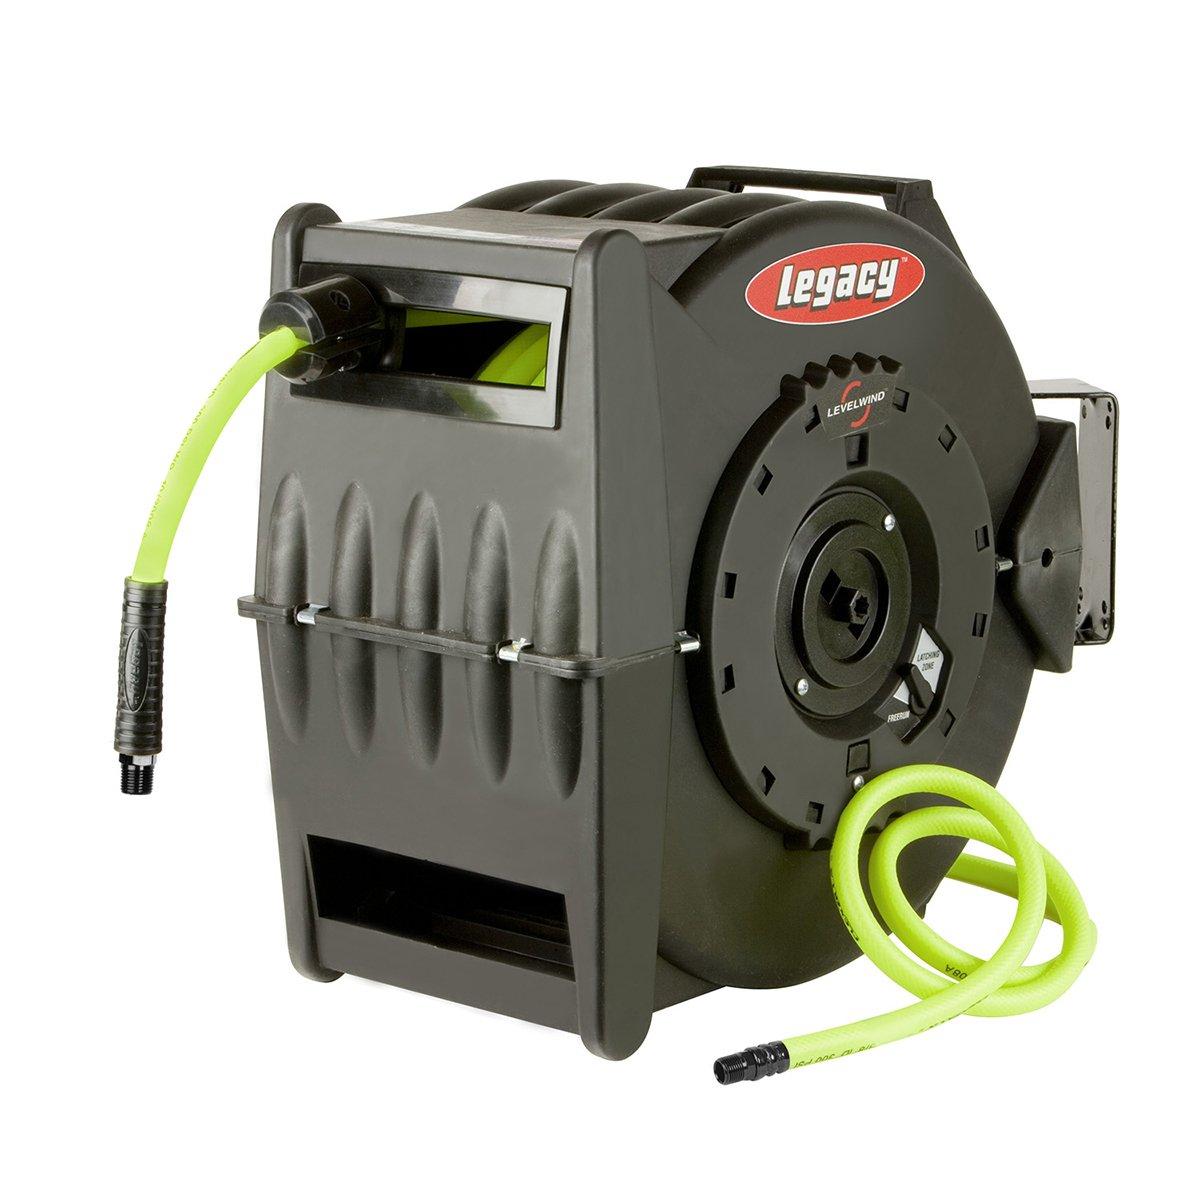 Flexzilla Levelwind Retractable Air Hose Reel, 3/8 in. x 75 ft, Heavy Duty, Lightweight, Hybrid, ZillaGreen - L8306FZ